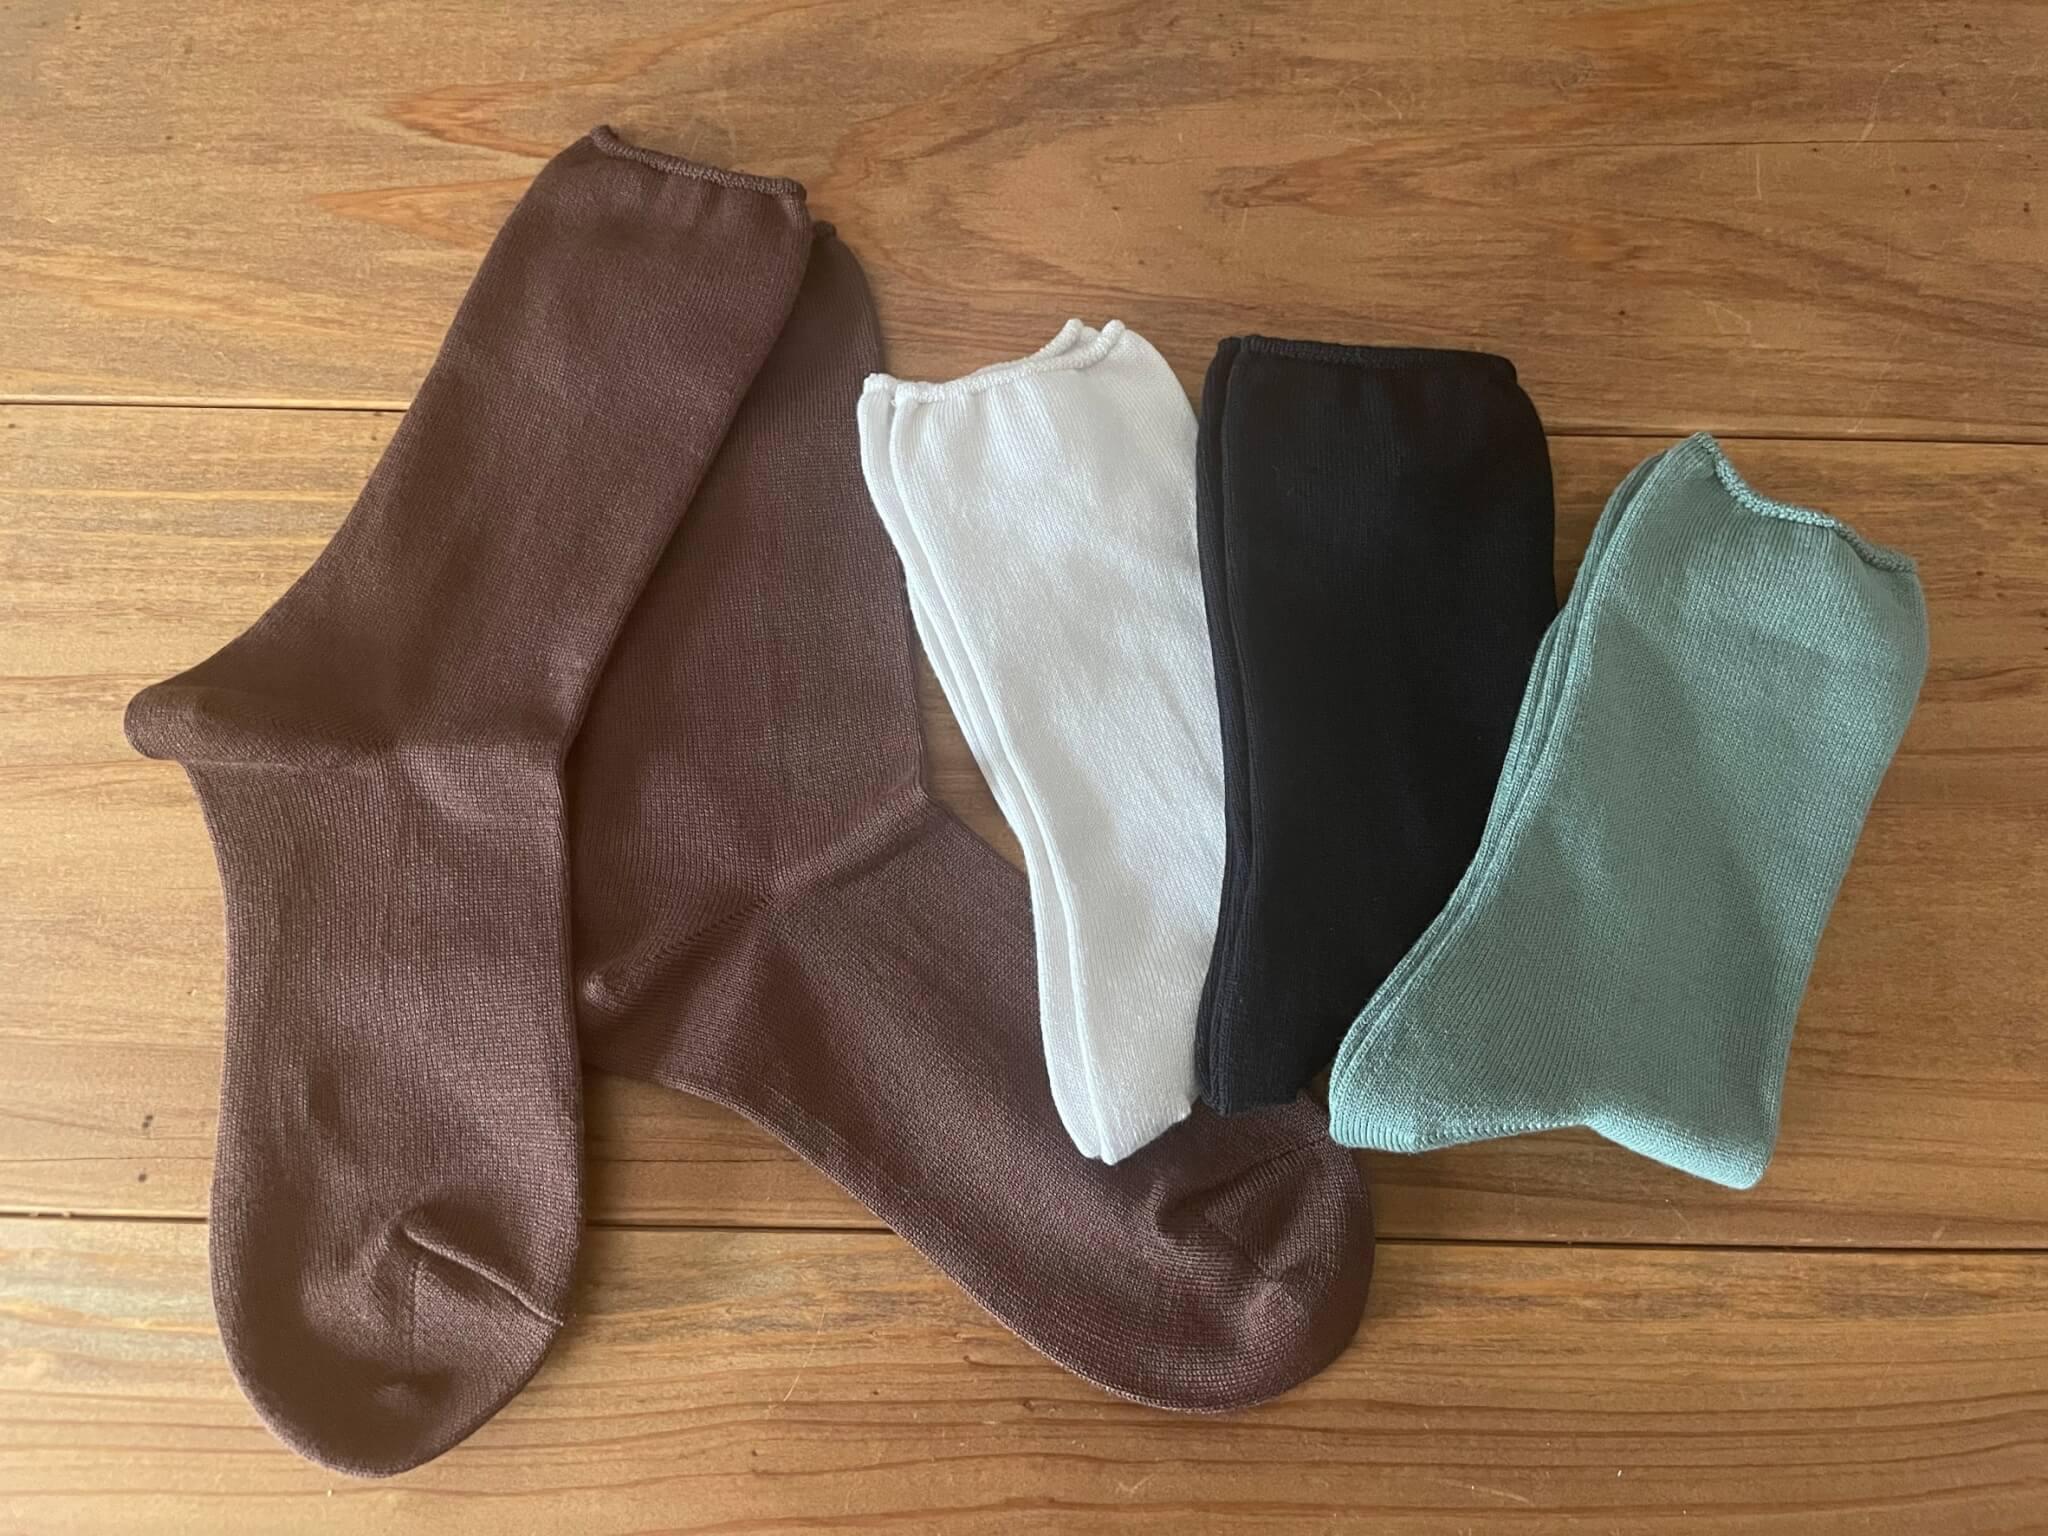 YUINO FAMILY NEW COLOR SOCKS 履き心地の良いYUINOのソックス